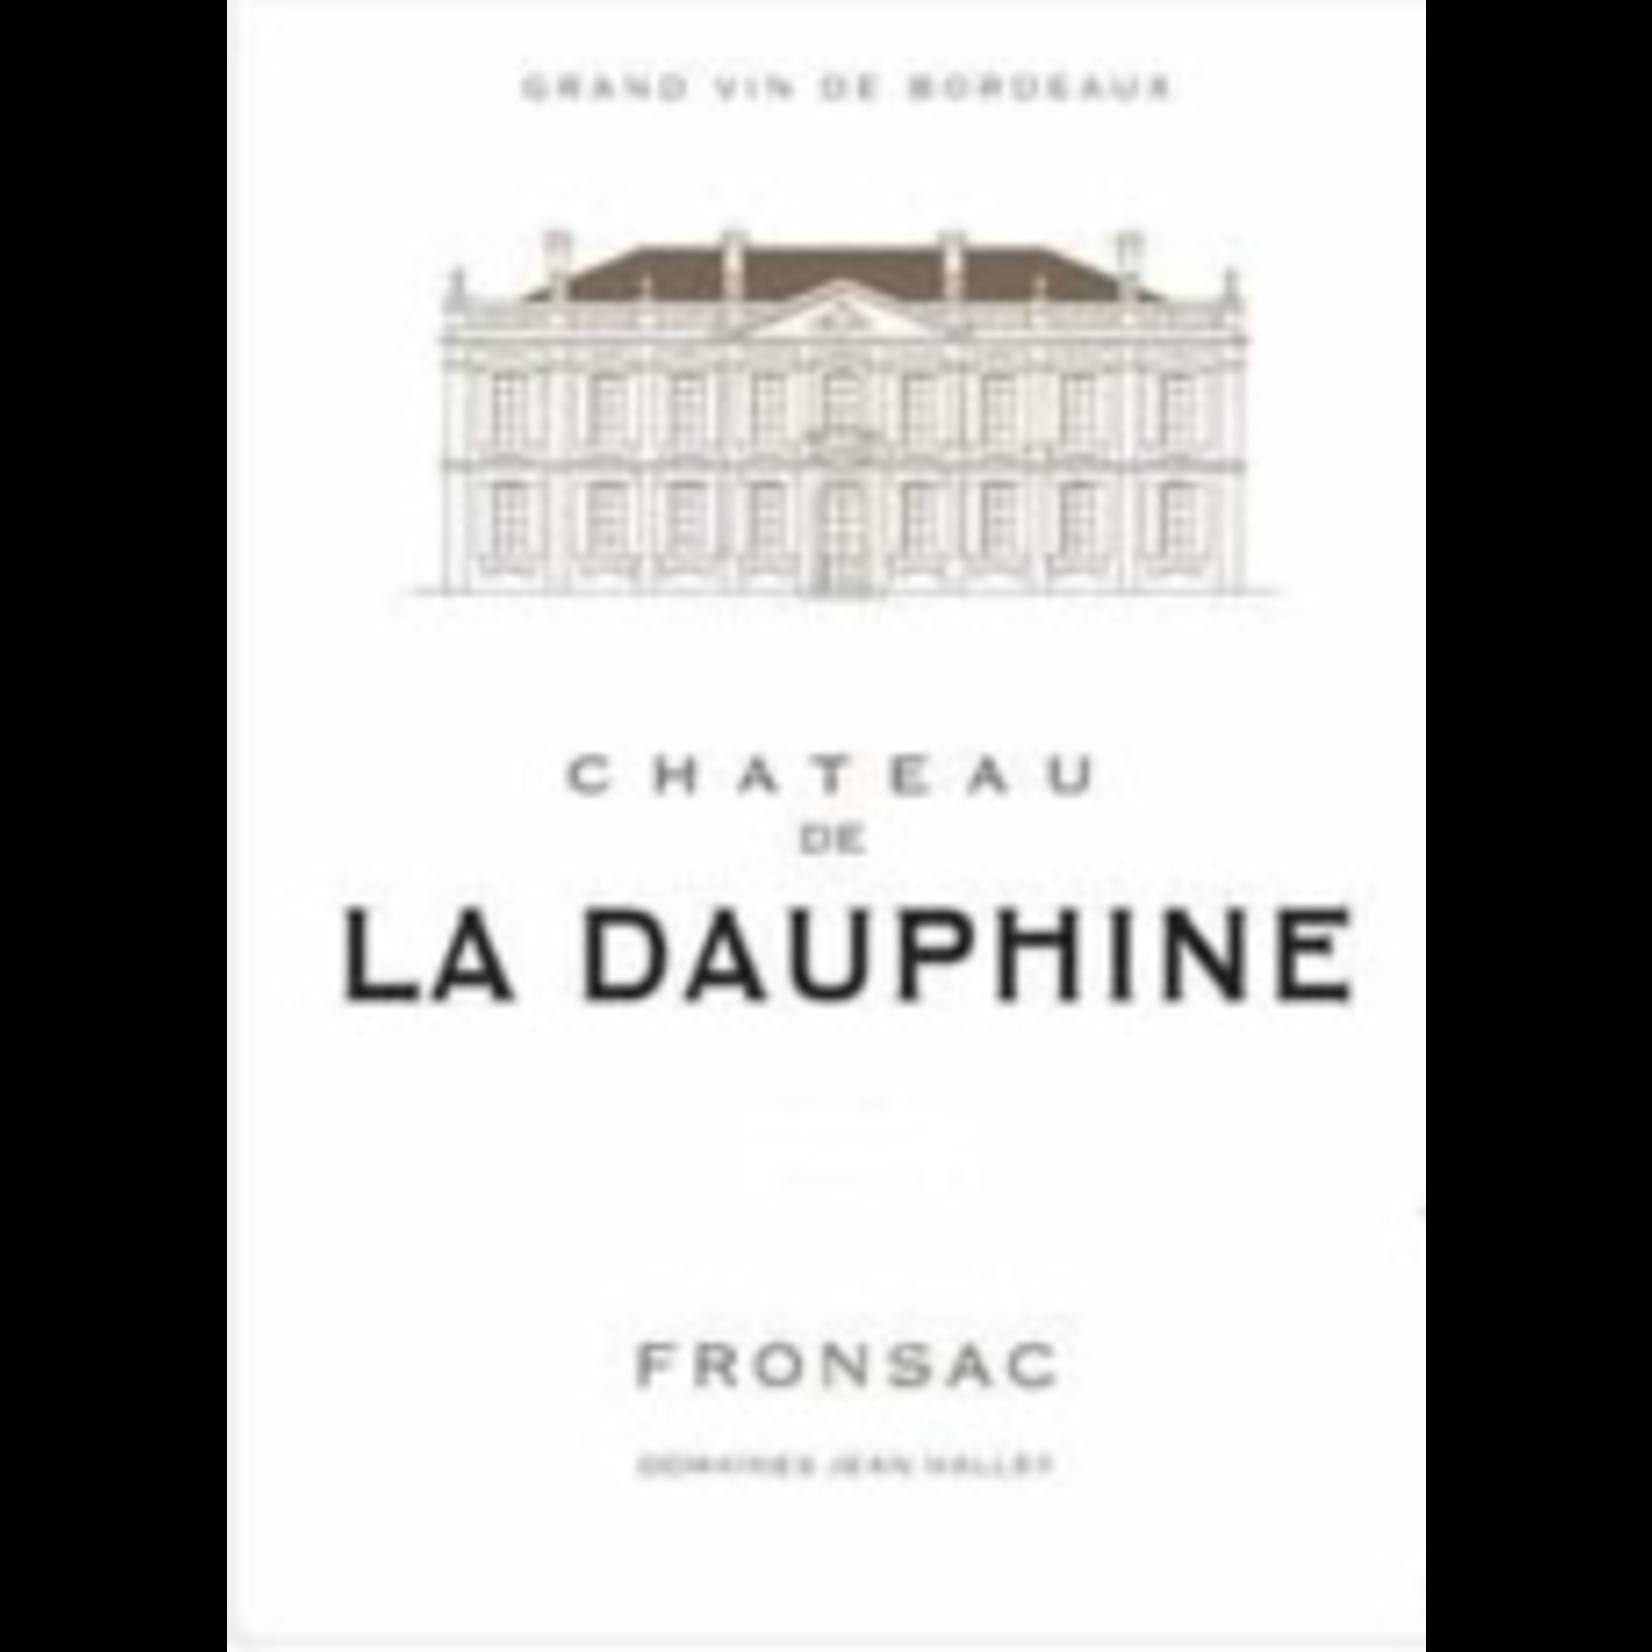 Wine Ch de la Dauphine